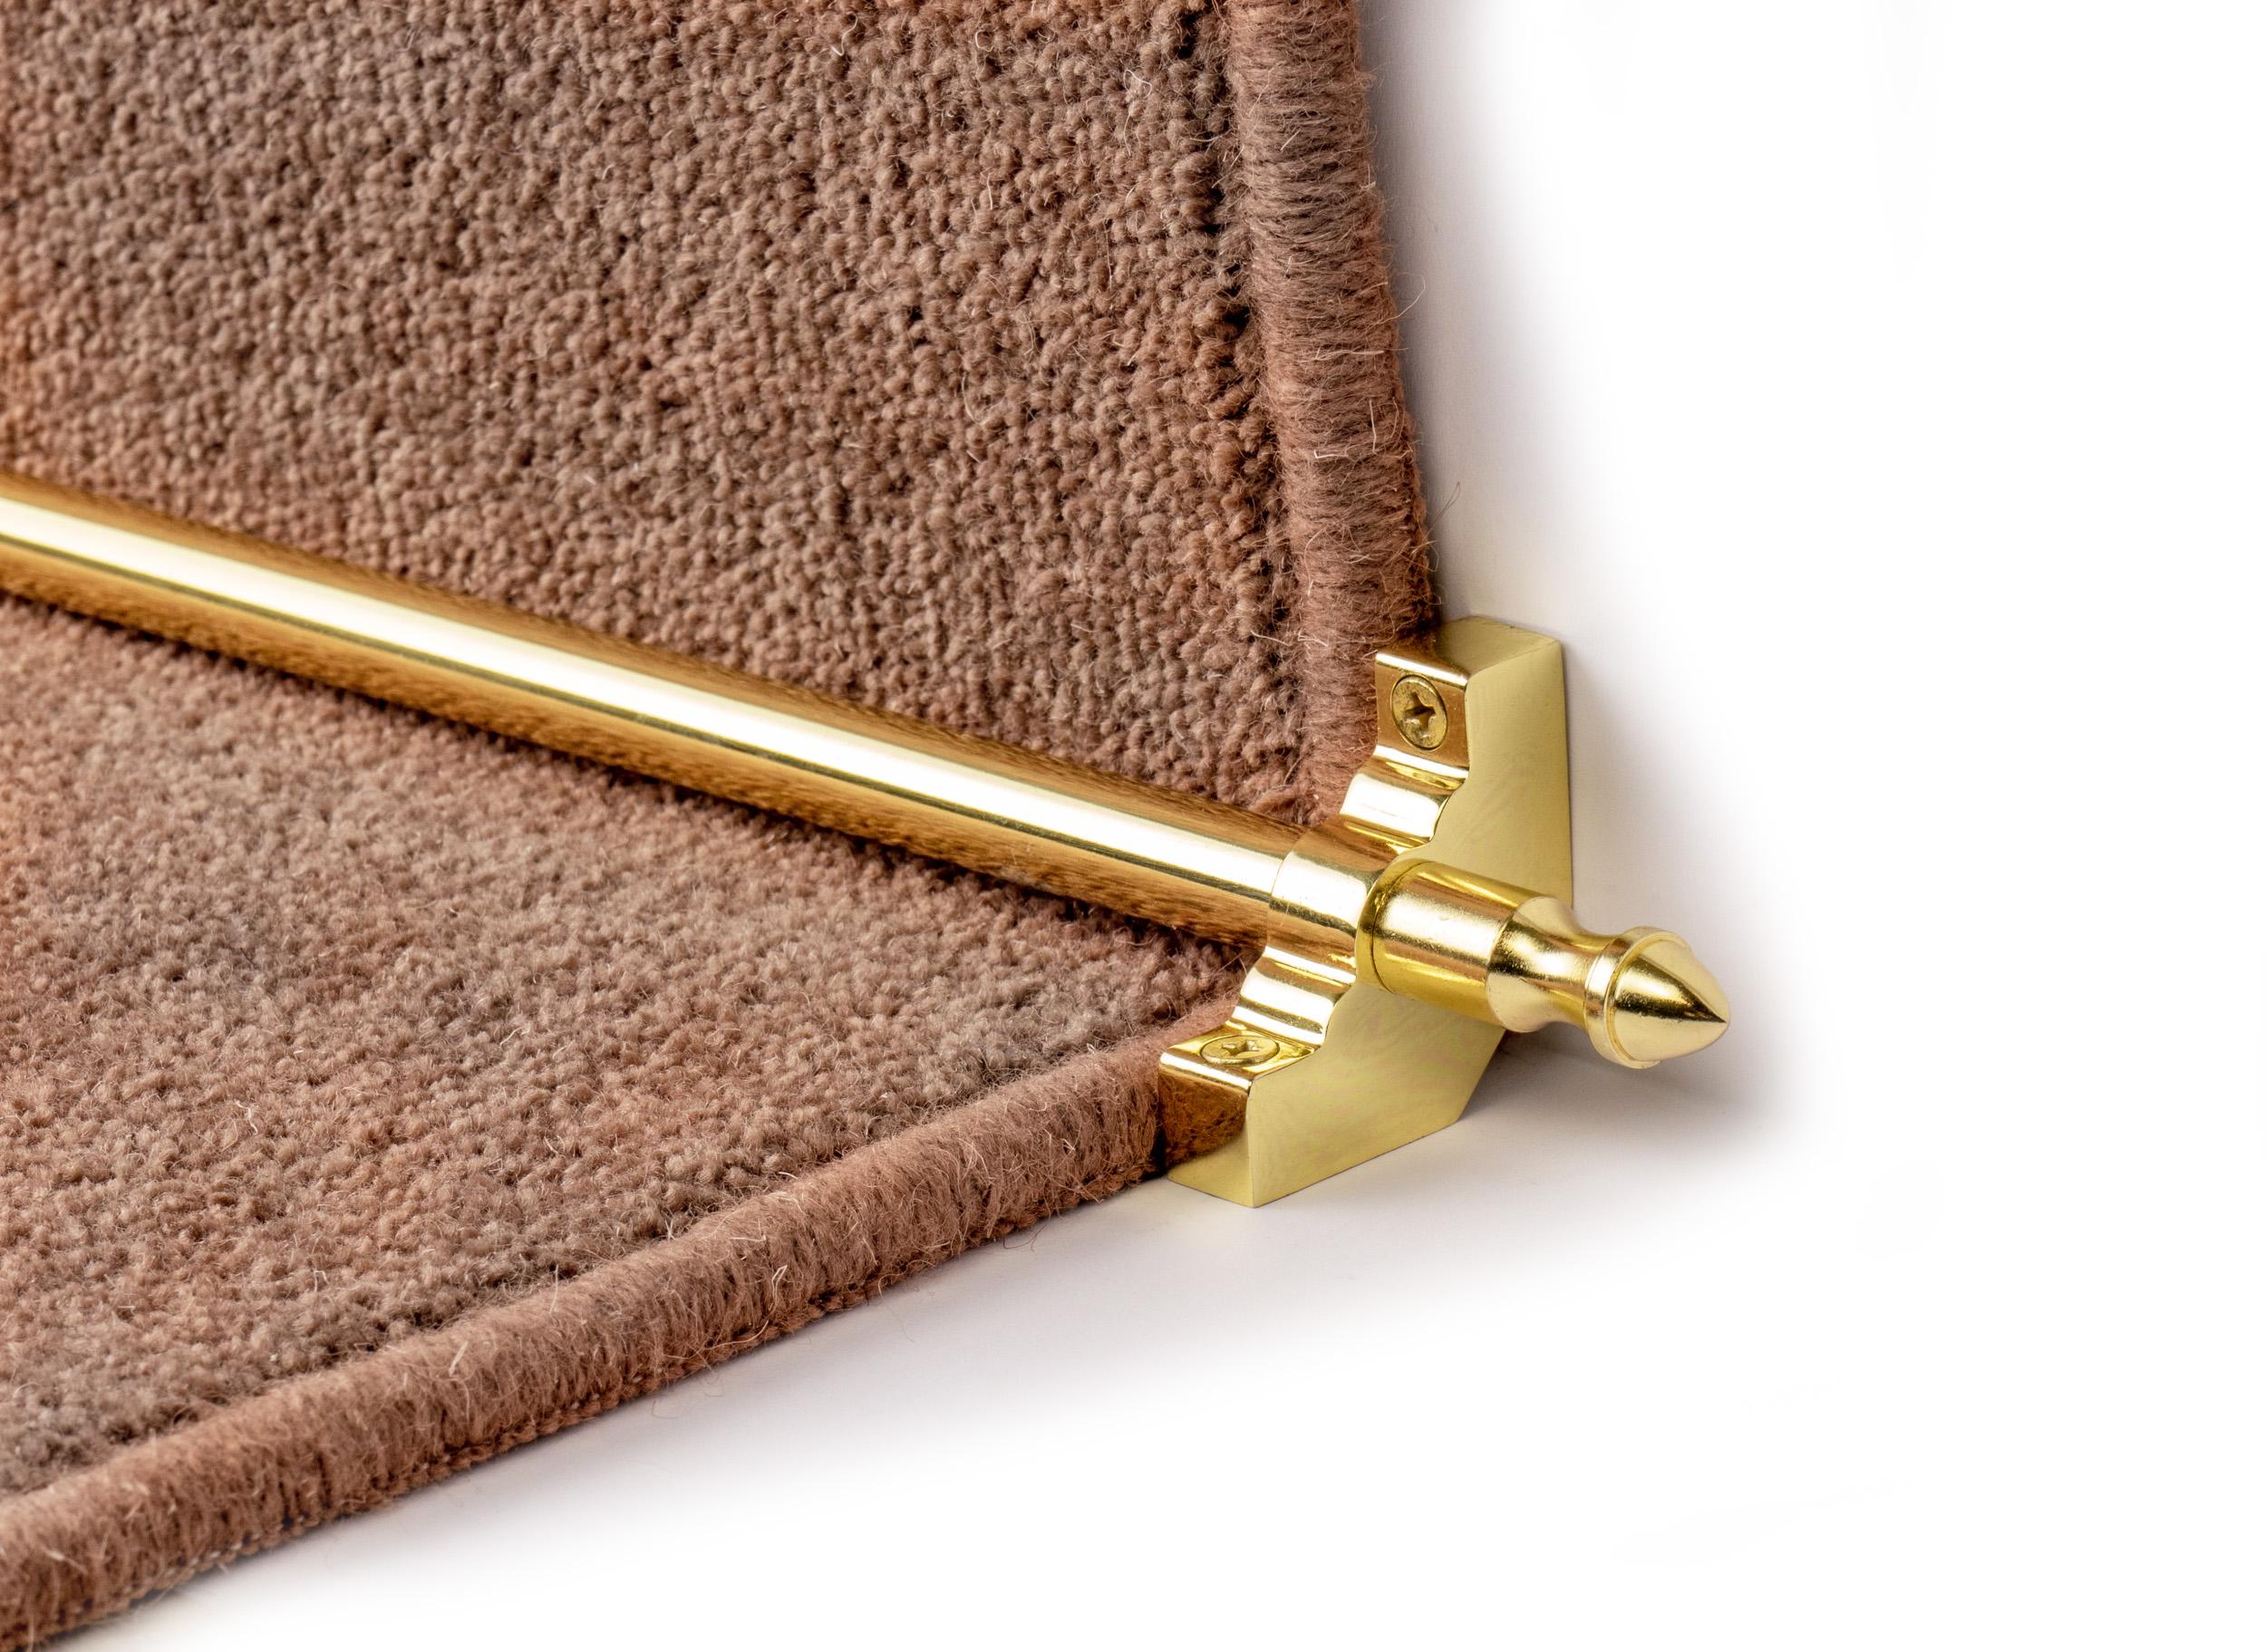 stairrods-brass-homepride.jpg